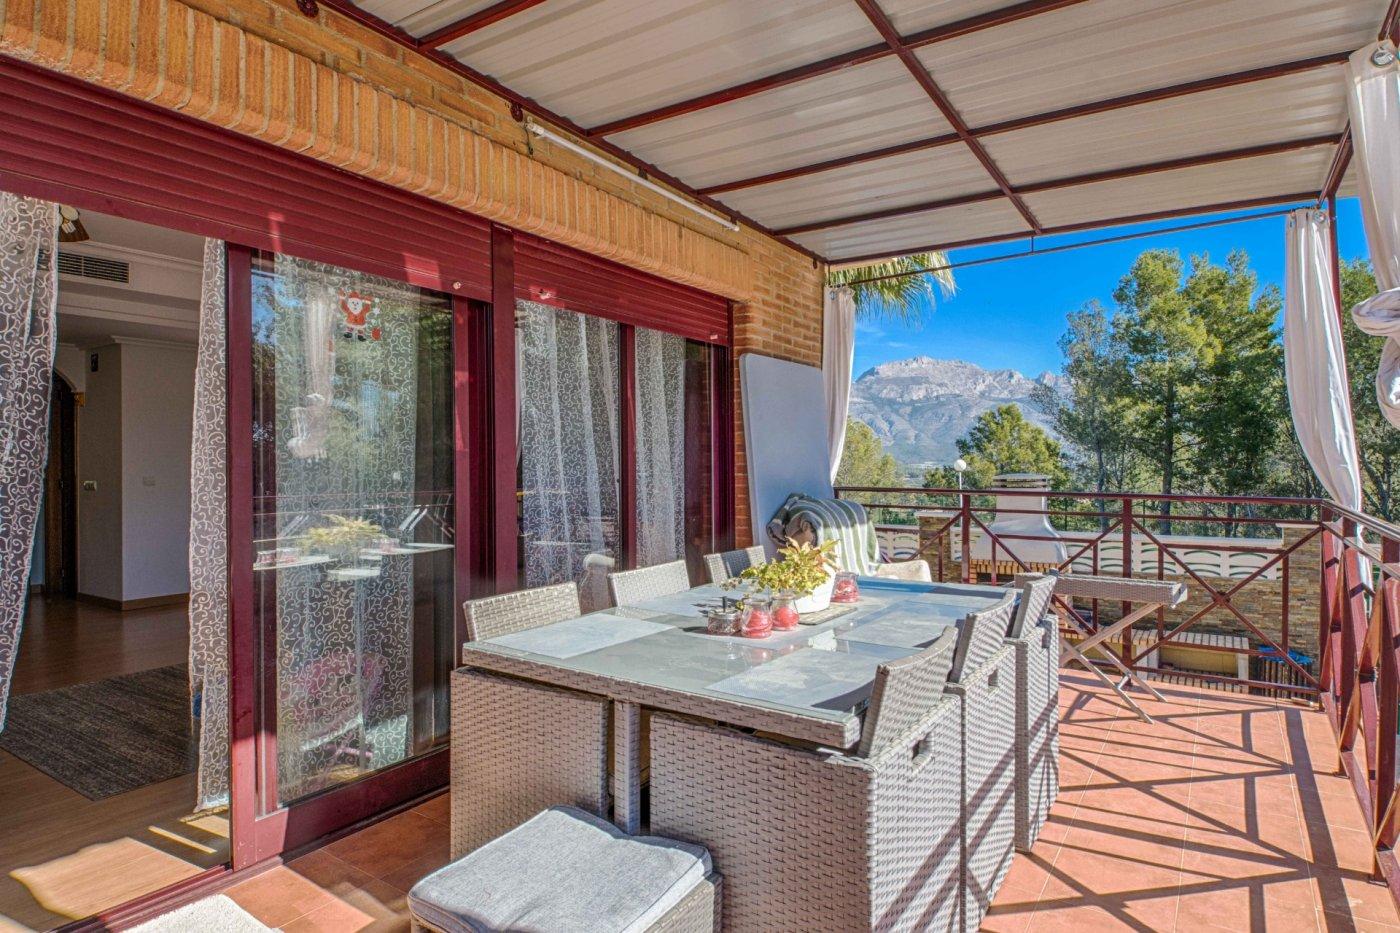 Real Estate Agents Altea - Properties for sale in Altea - townhouse - la-nucia